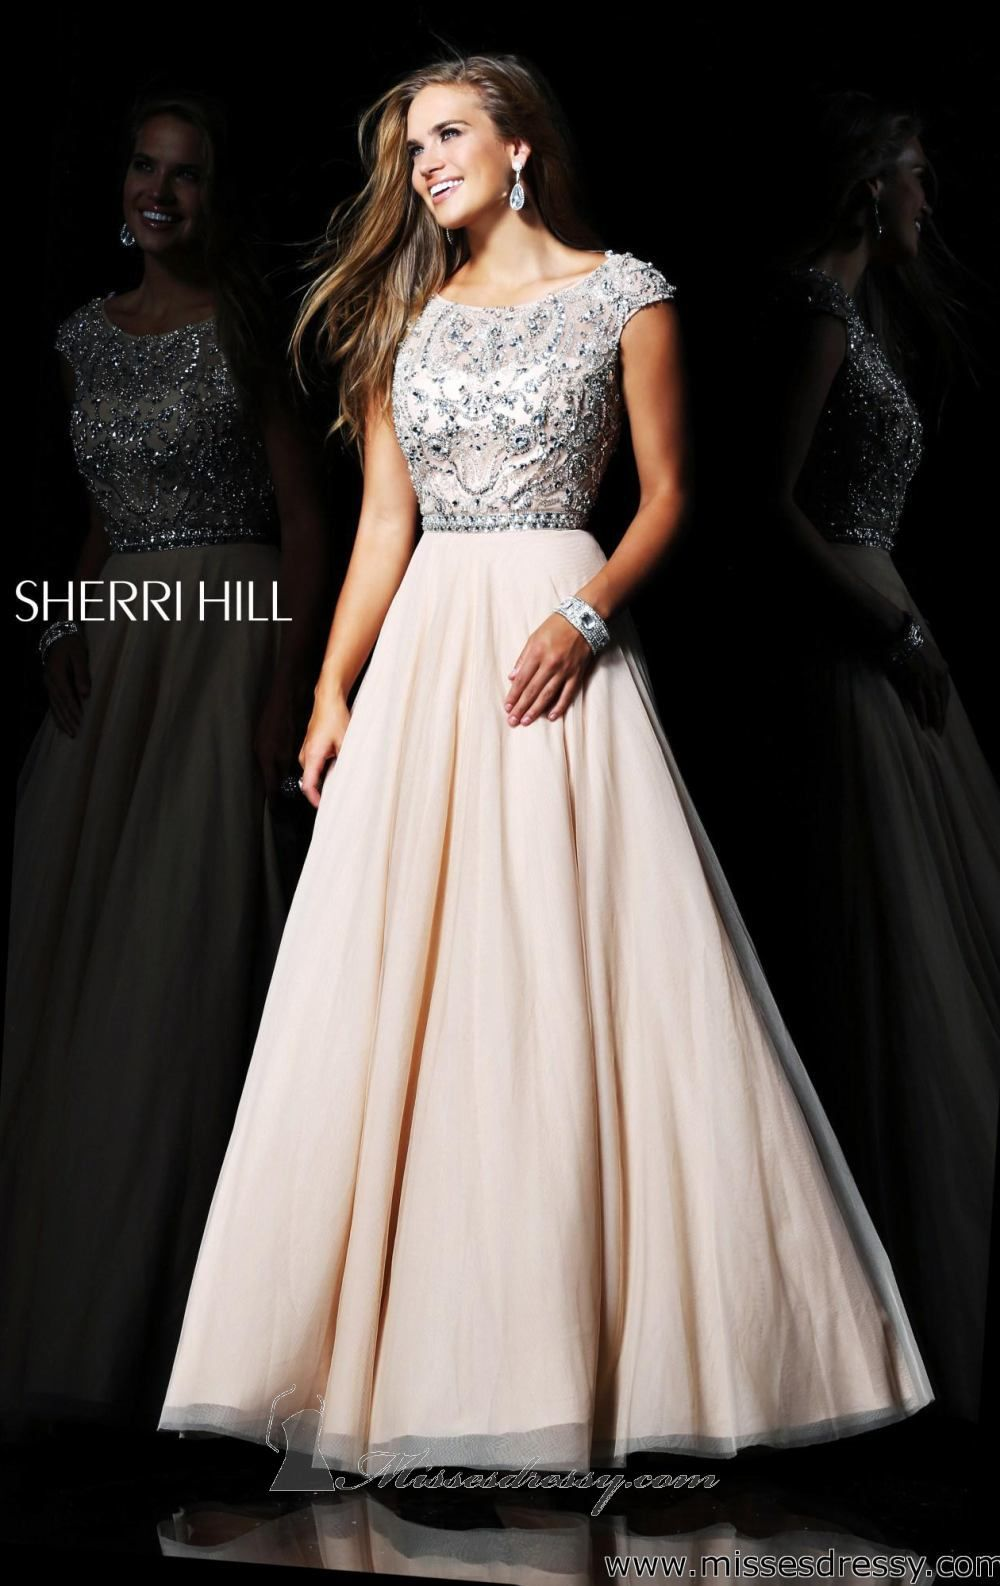 sherri hill Fashion Pinterest Dream dress Prom and Formal